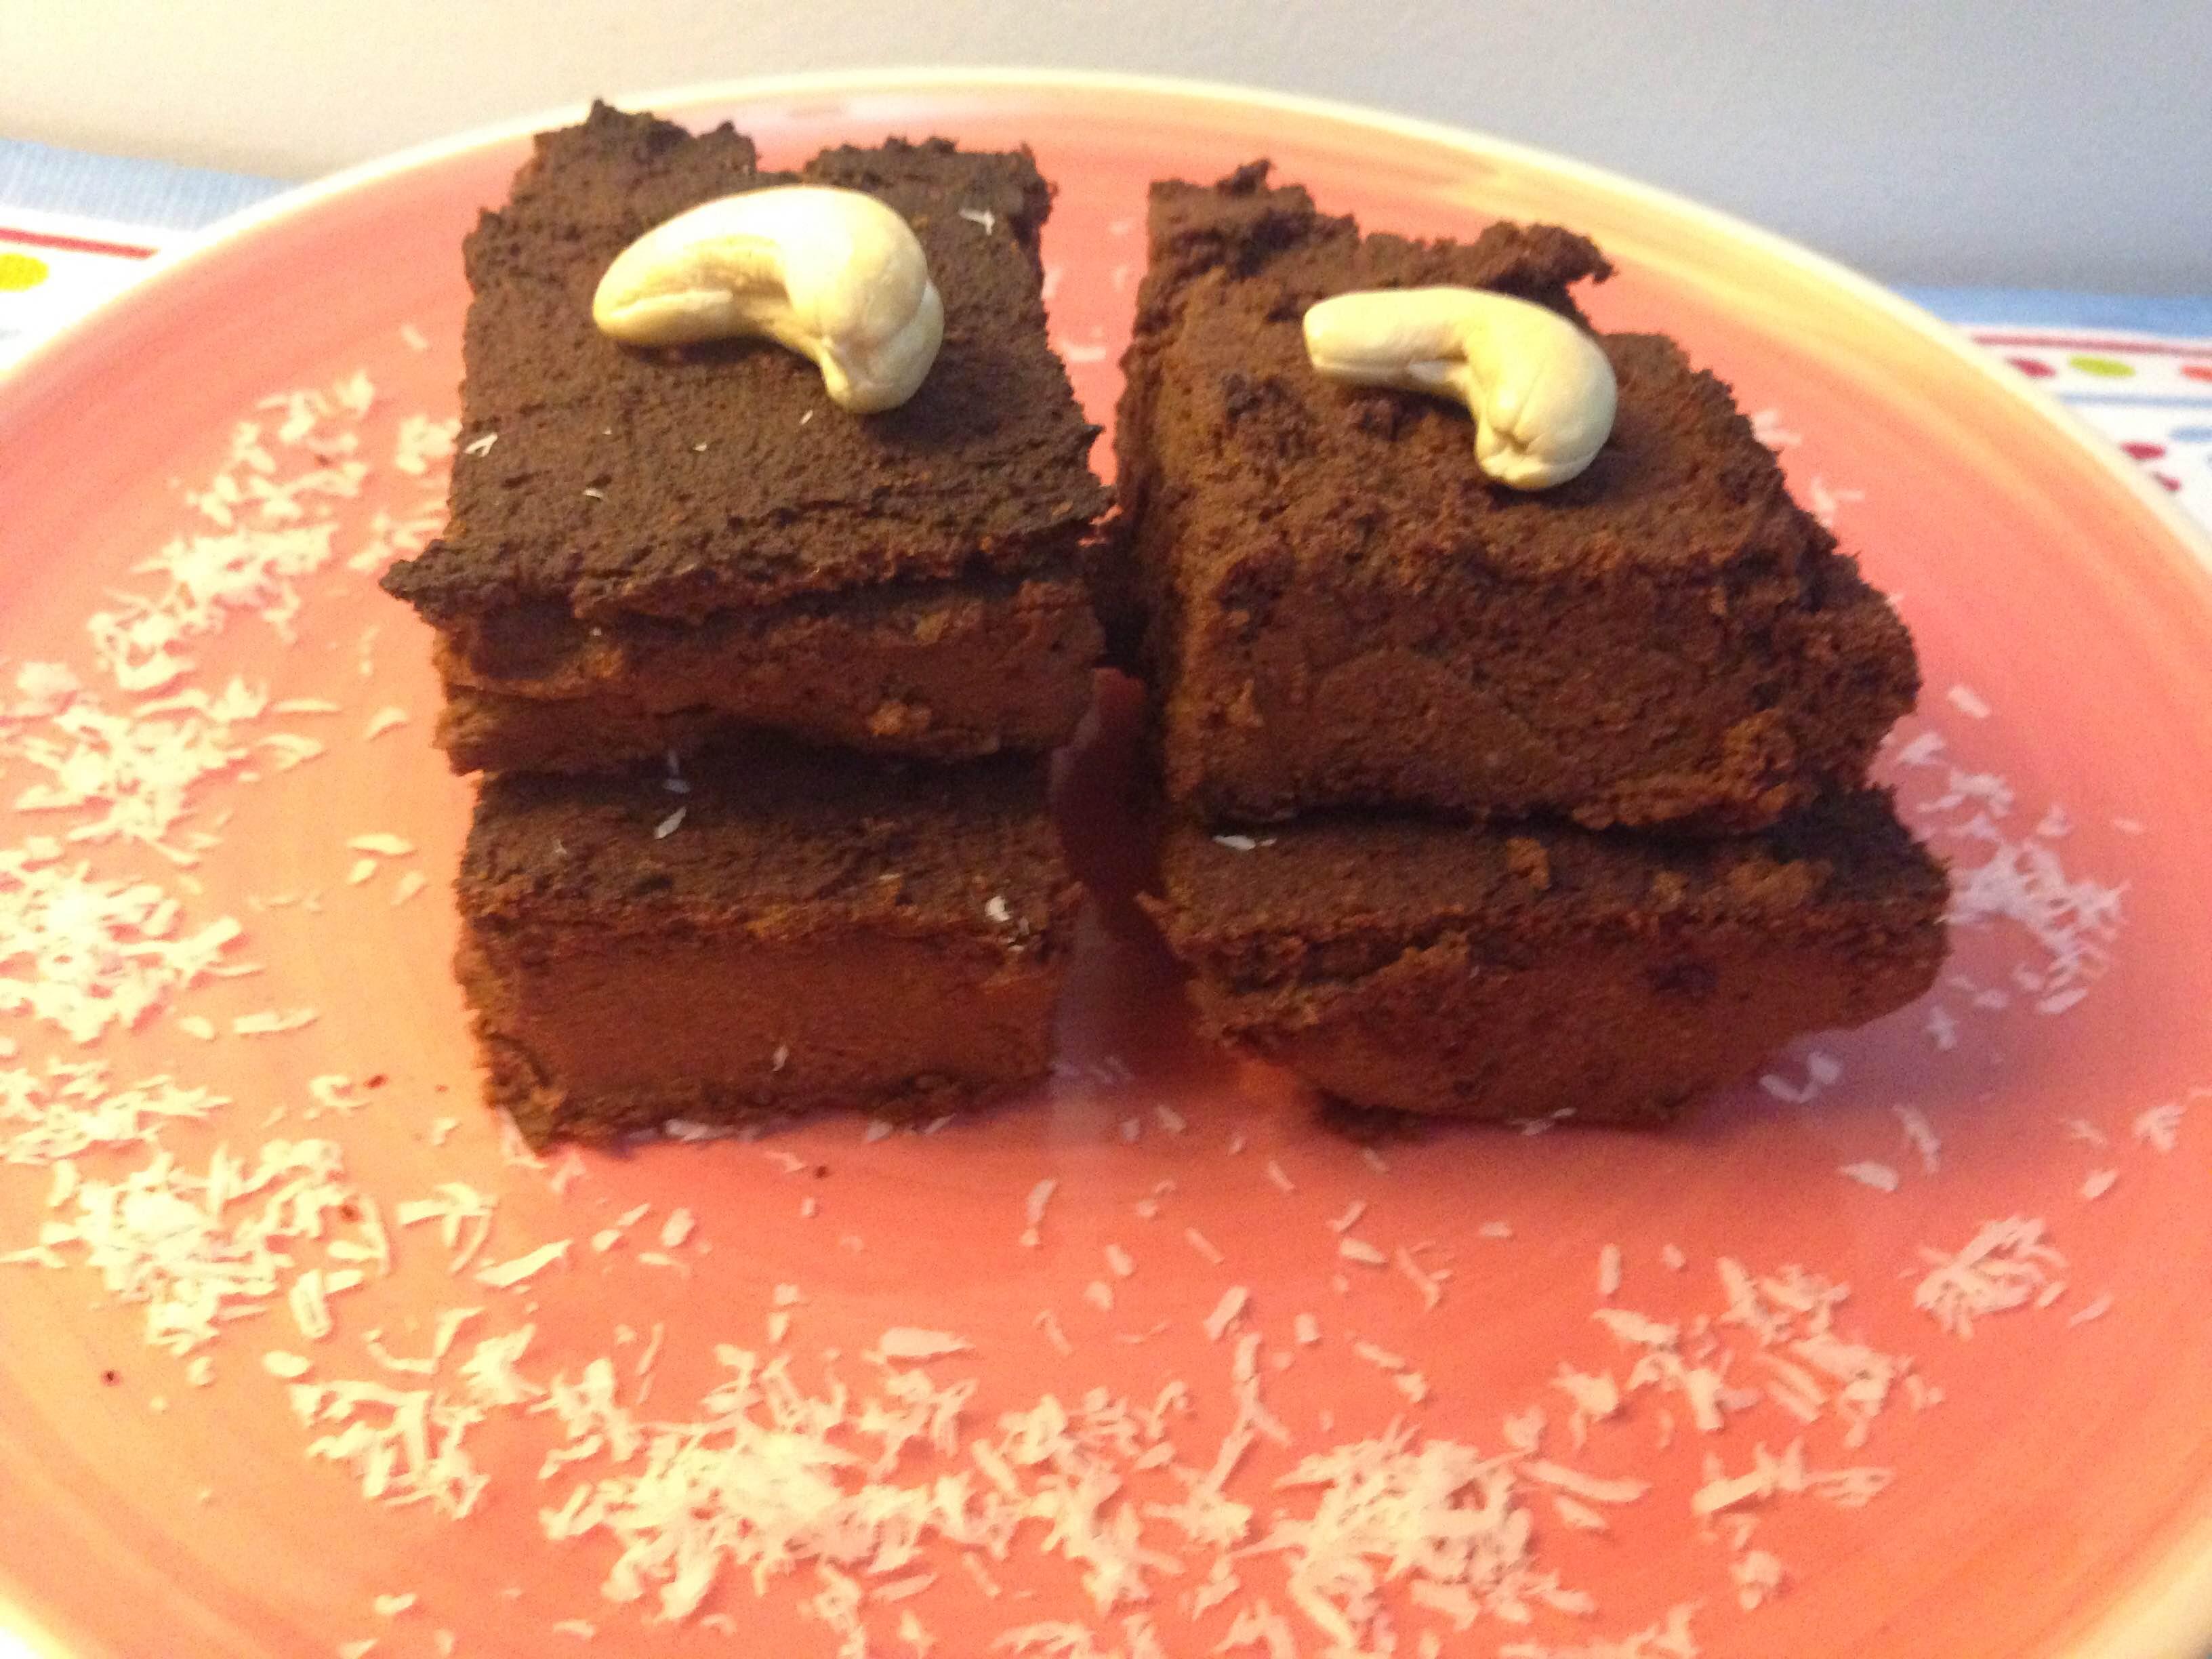 Brownie de chocolate e batata-doce